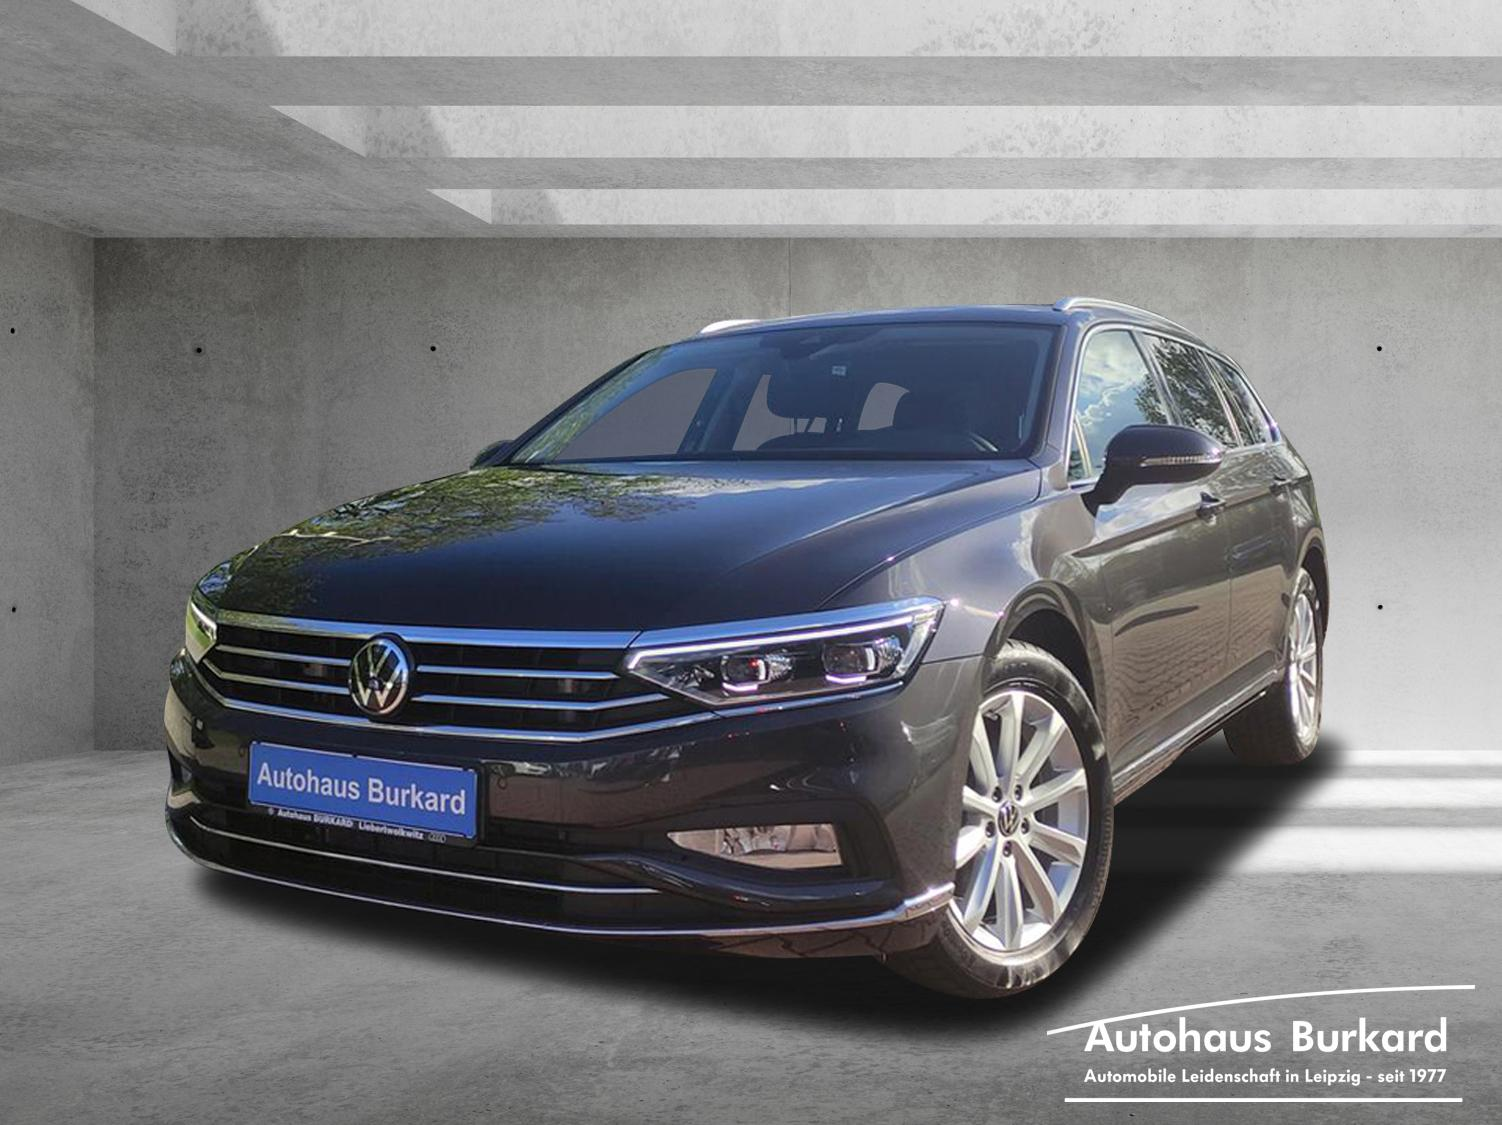 Volkswagen Passat Var. Elegance 2.0 TDI+DSG+LED+RÃckfahrk, Jahr 2020, Diesel